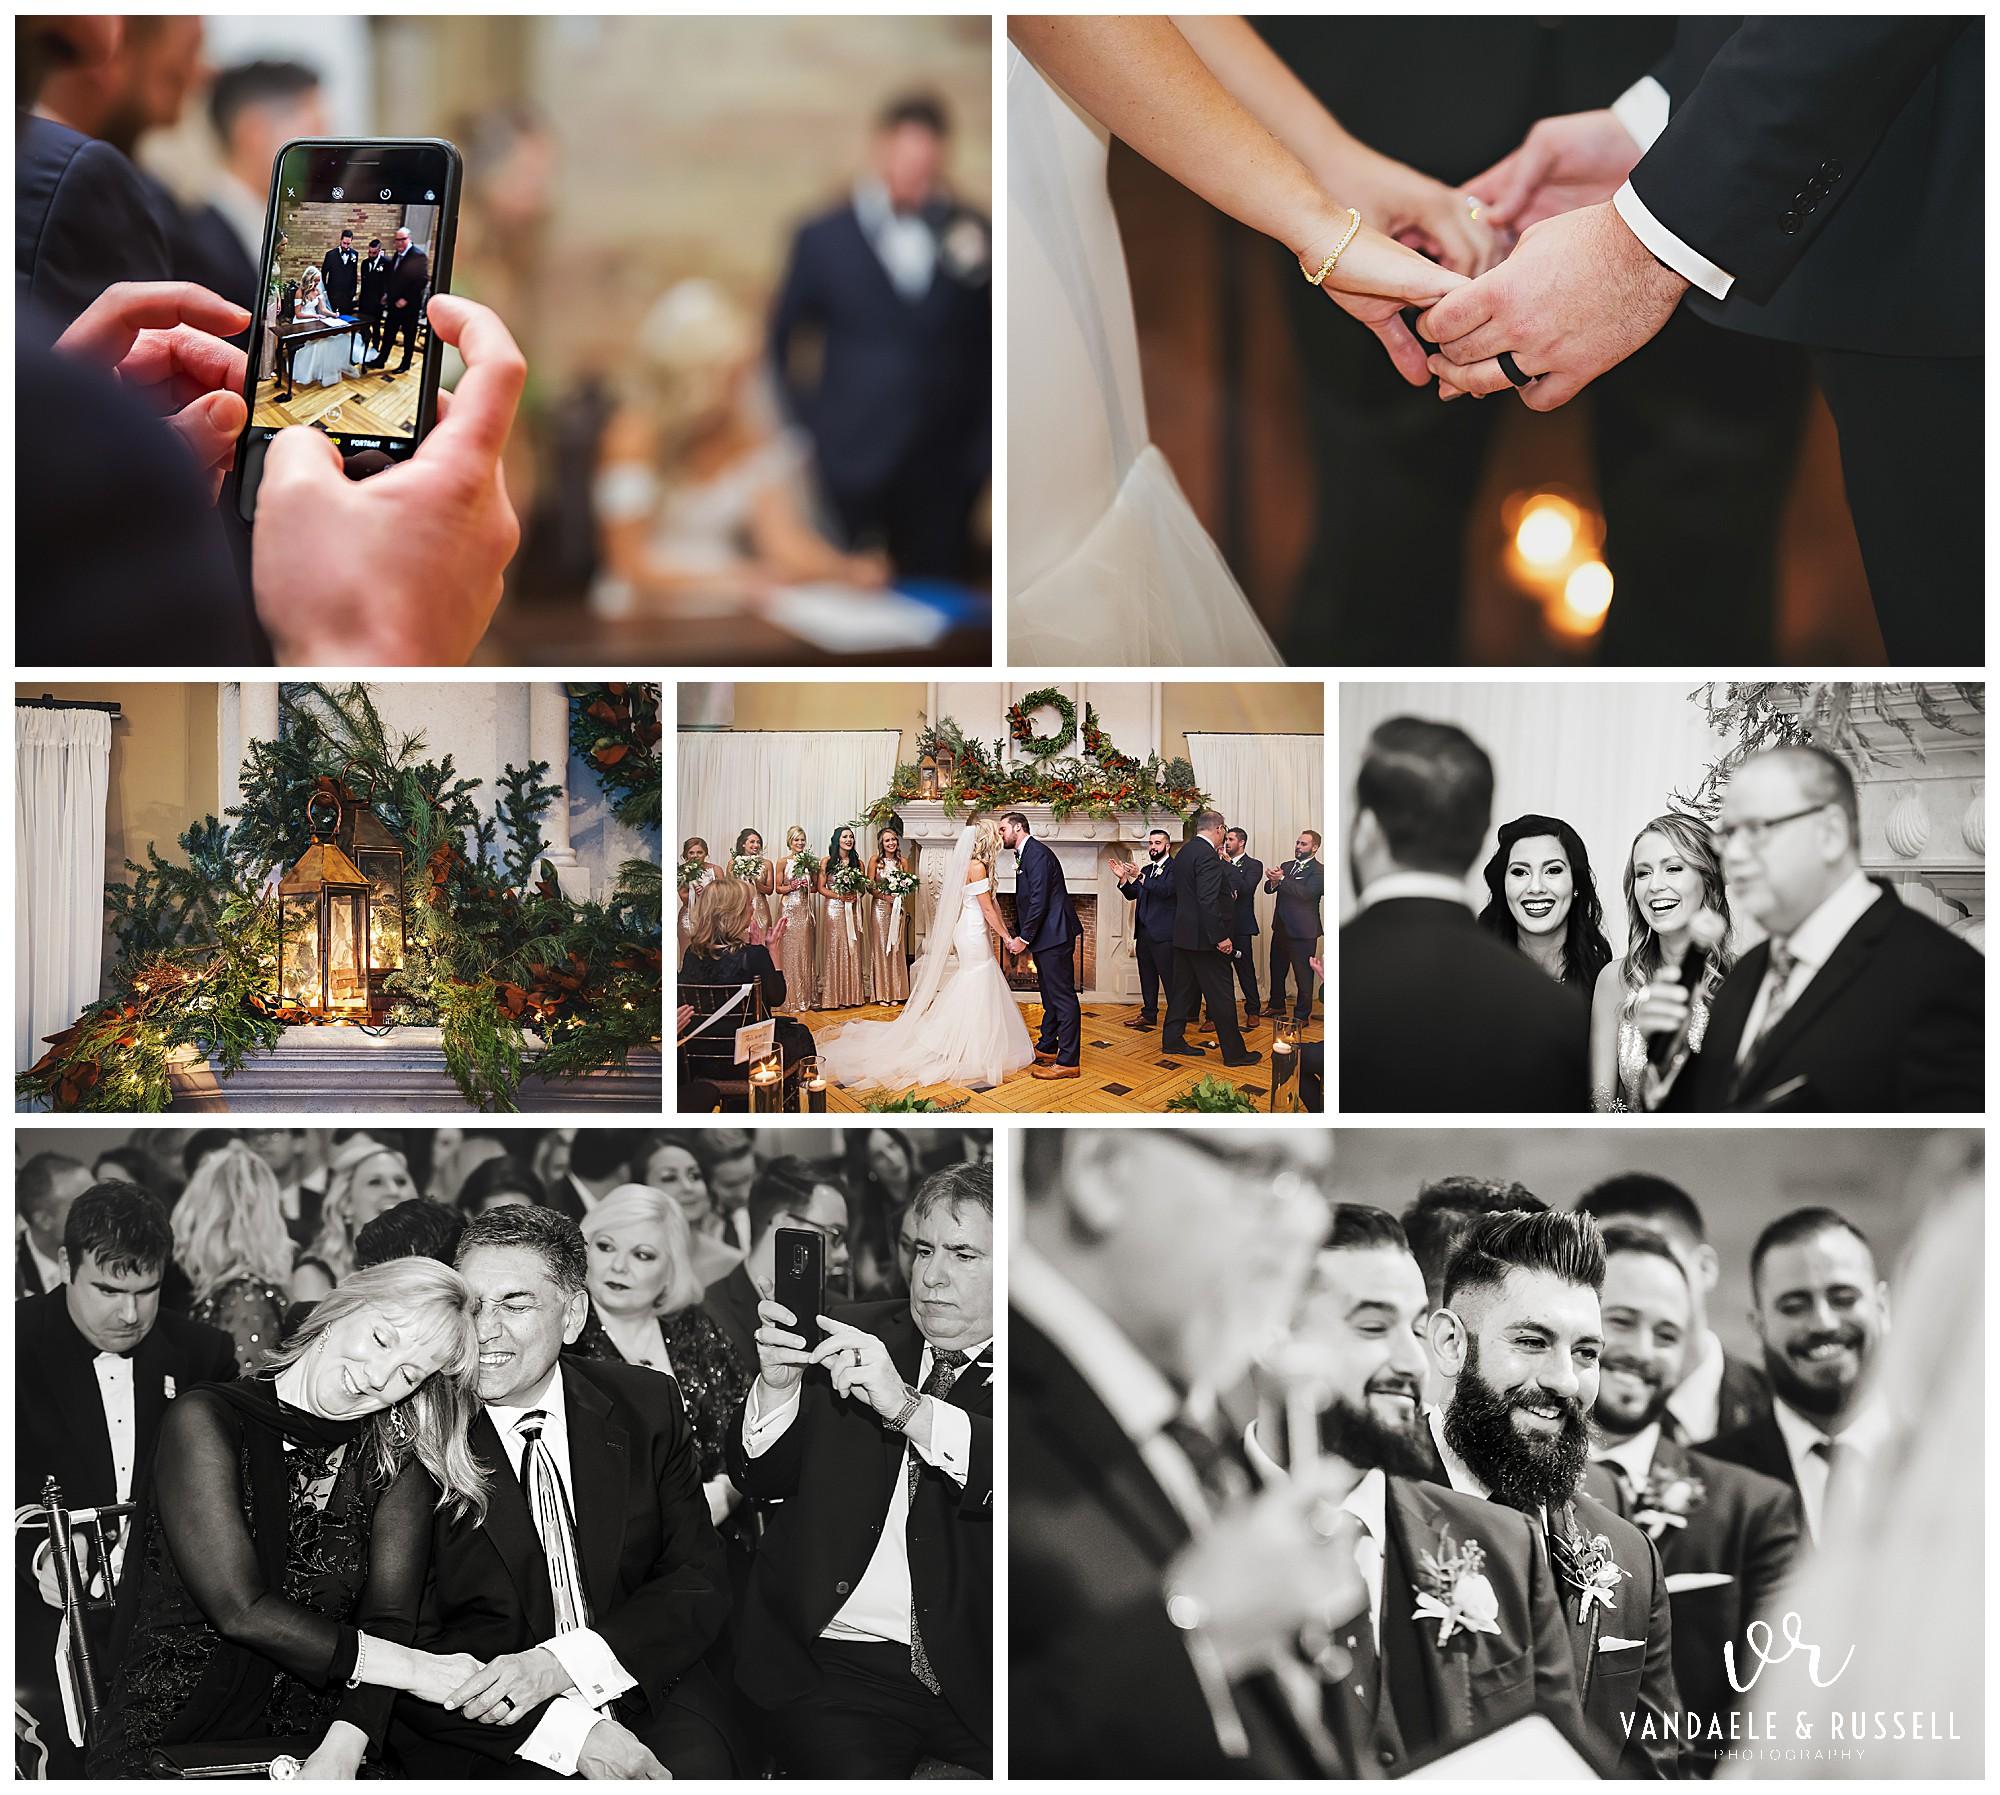 Hacienda-Sarria-Wedding-Photos-NYE-Michelle-Matt-VanDaele-Russell_0035.jpg